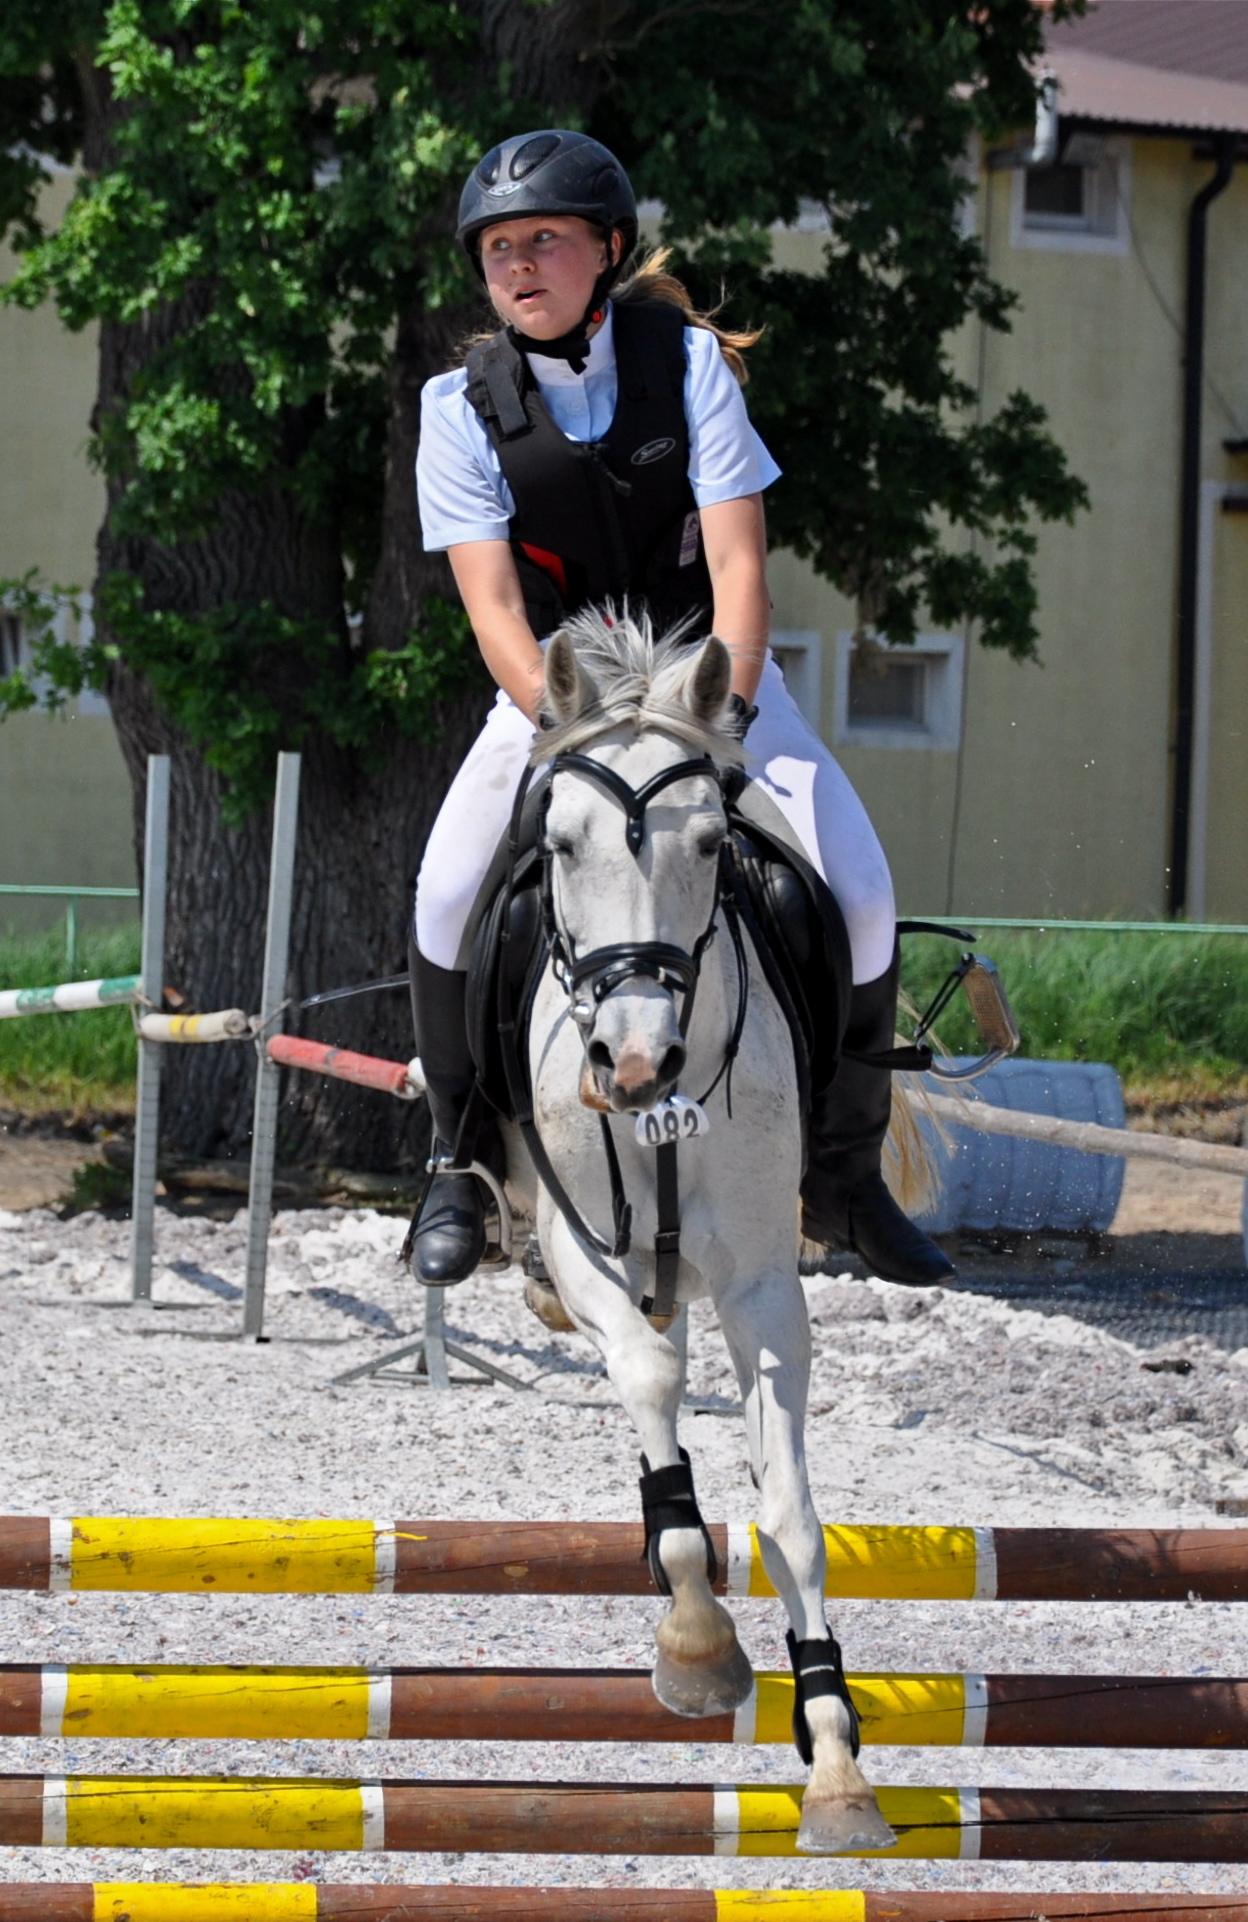 karolina_marszaek-illiada-jaszkowo_2011_1_20120103_1296629893